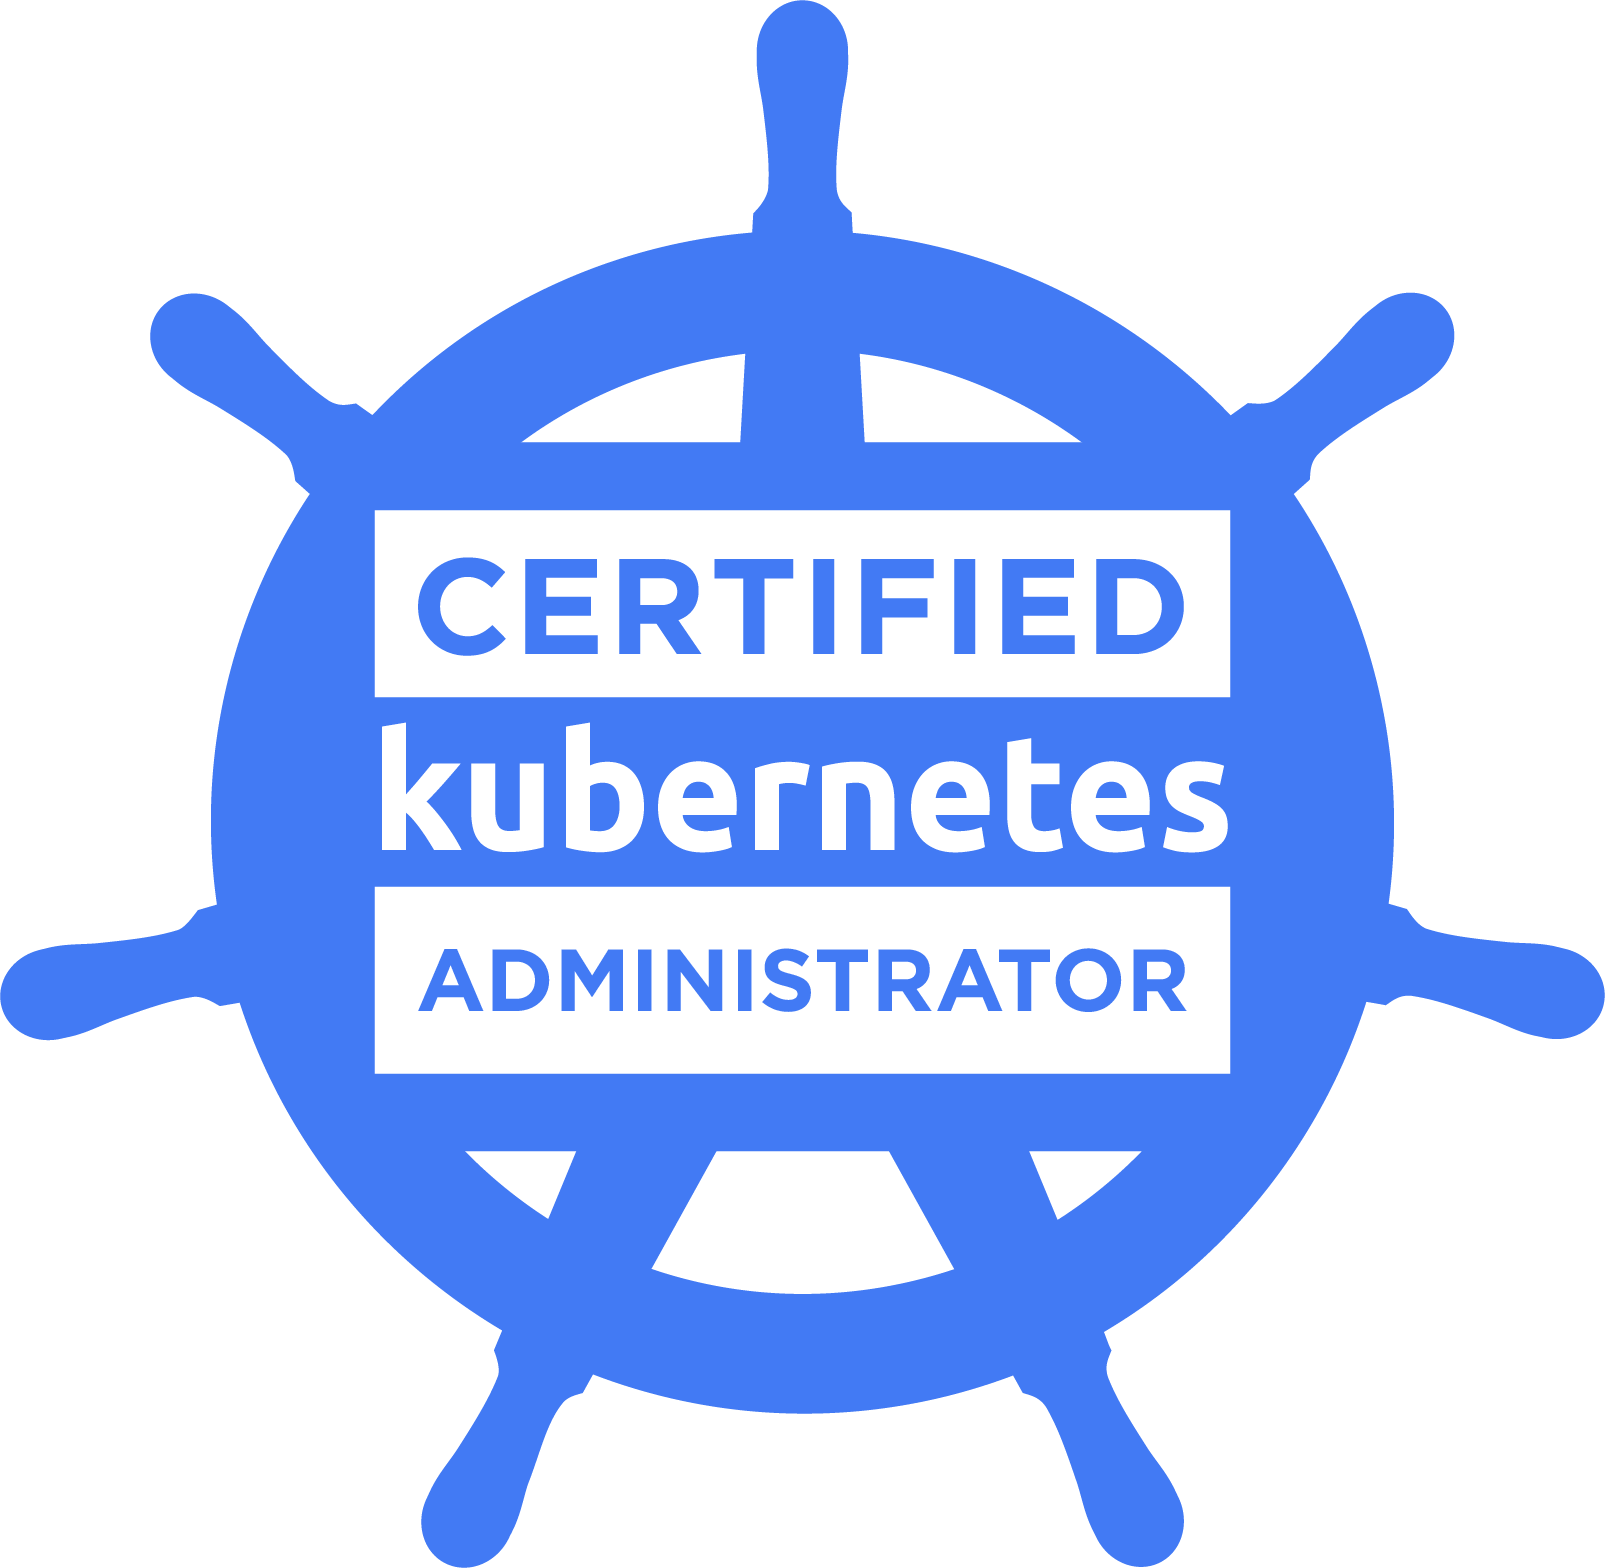 CKA Certified Kubernetes Administrator logo